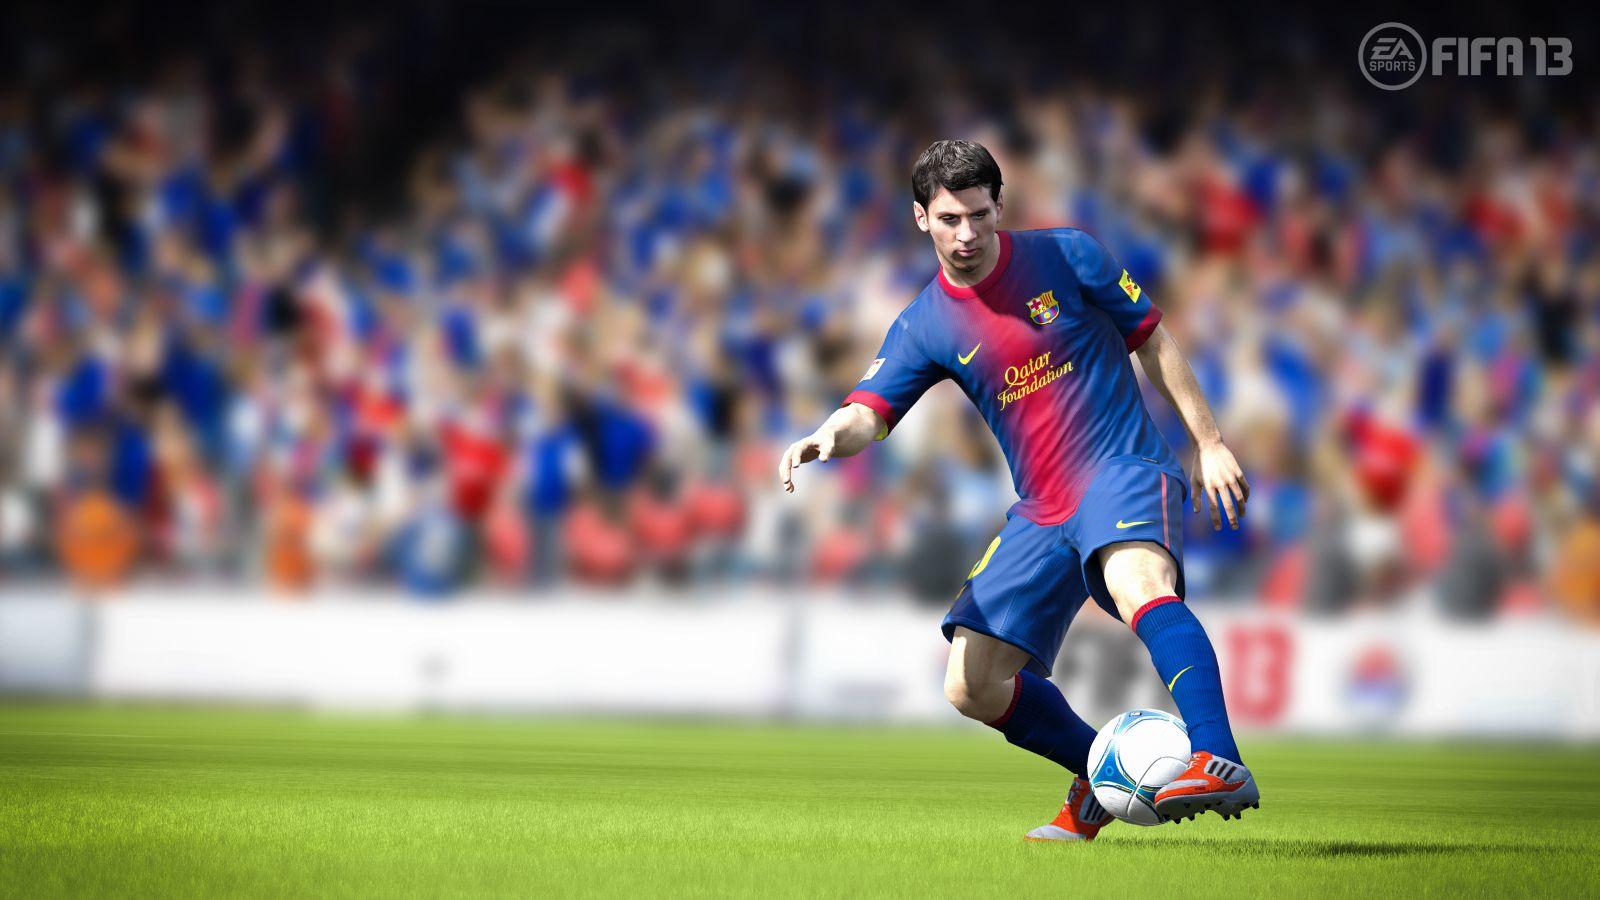 FIFA 13: dojmy z prezentace z Edenu 68892